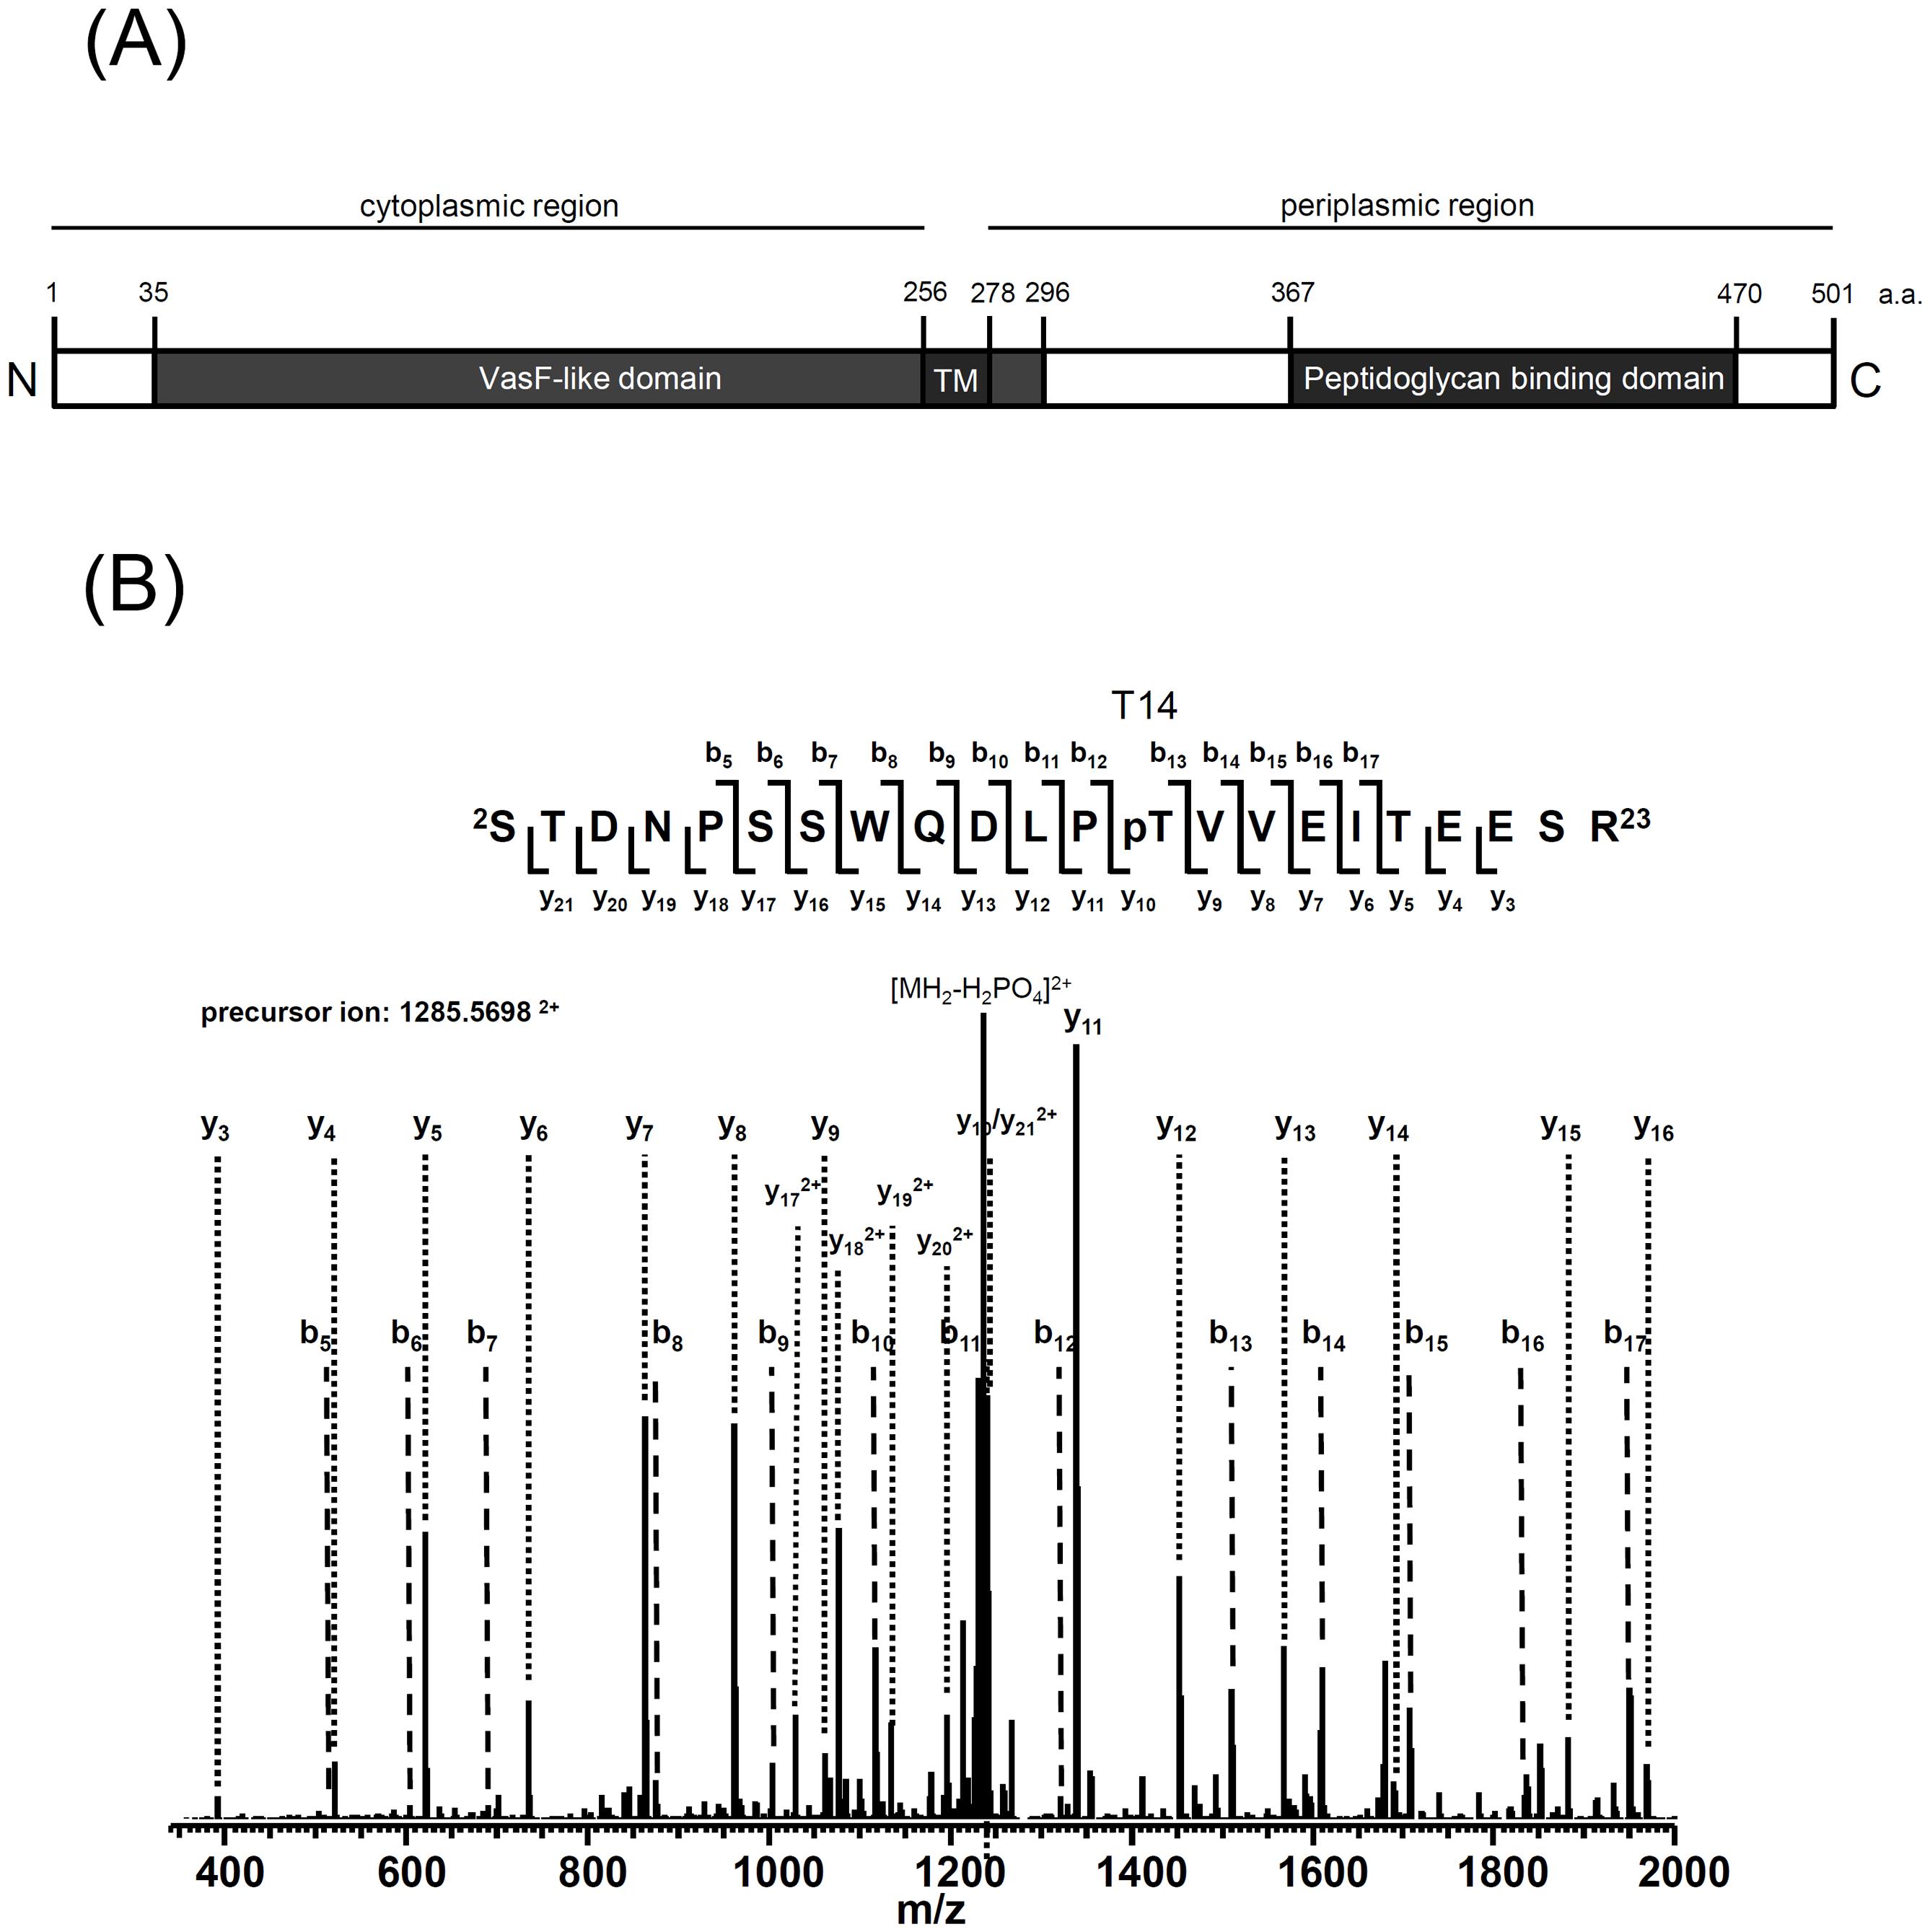 Mass spectrometry identification of TssL phosphorylation at Thr 14.